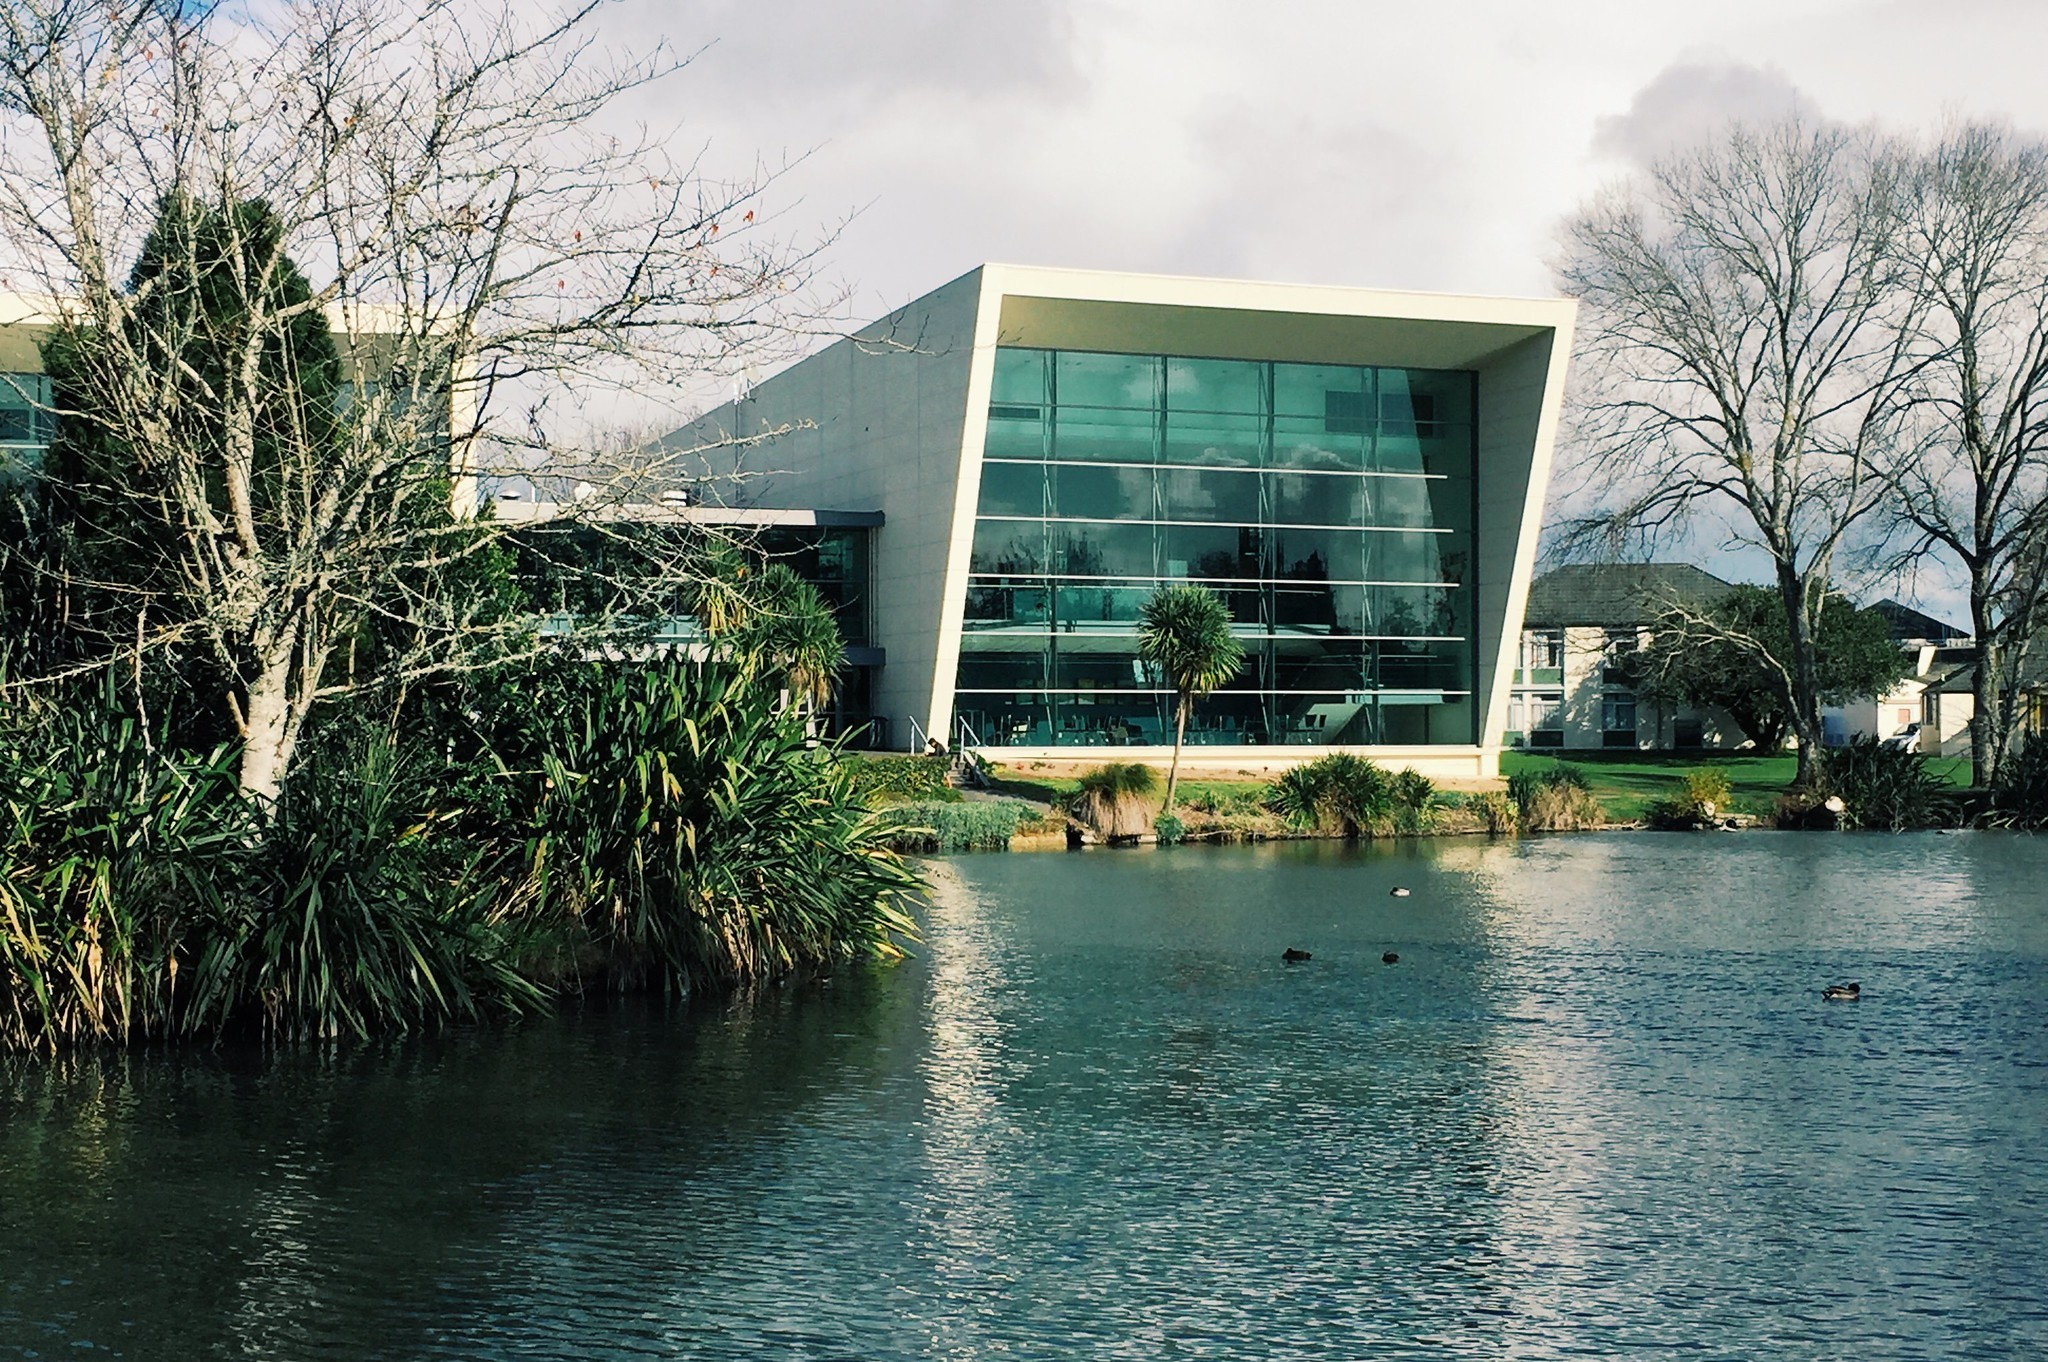 2-visto-de-estudante-neozelandes